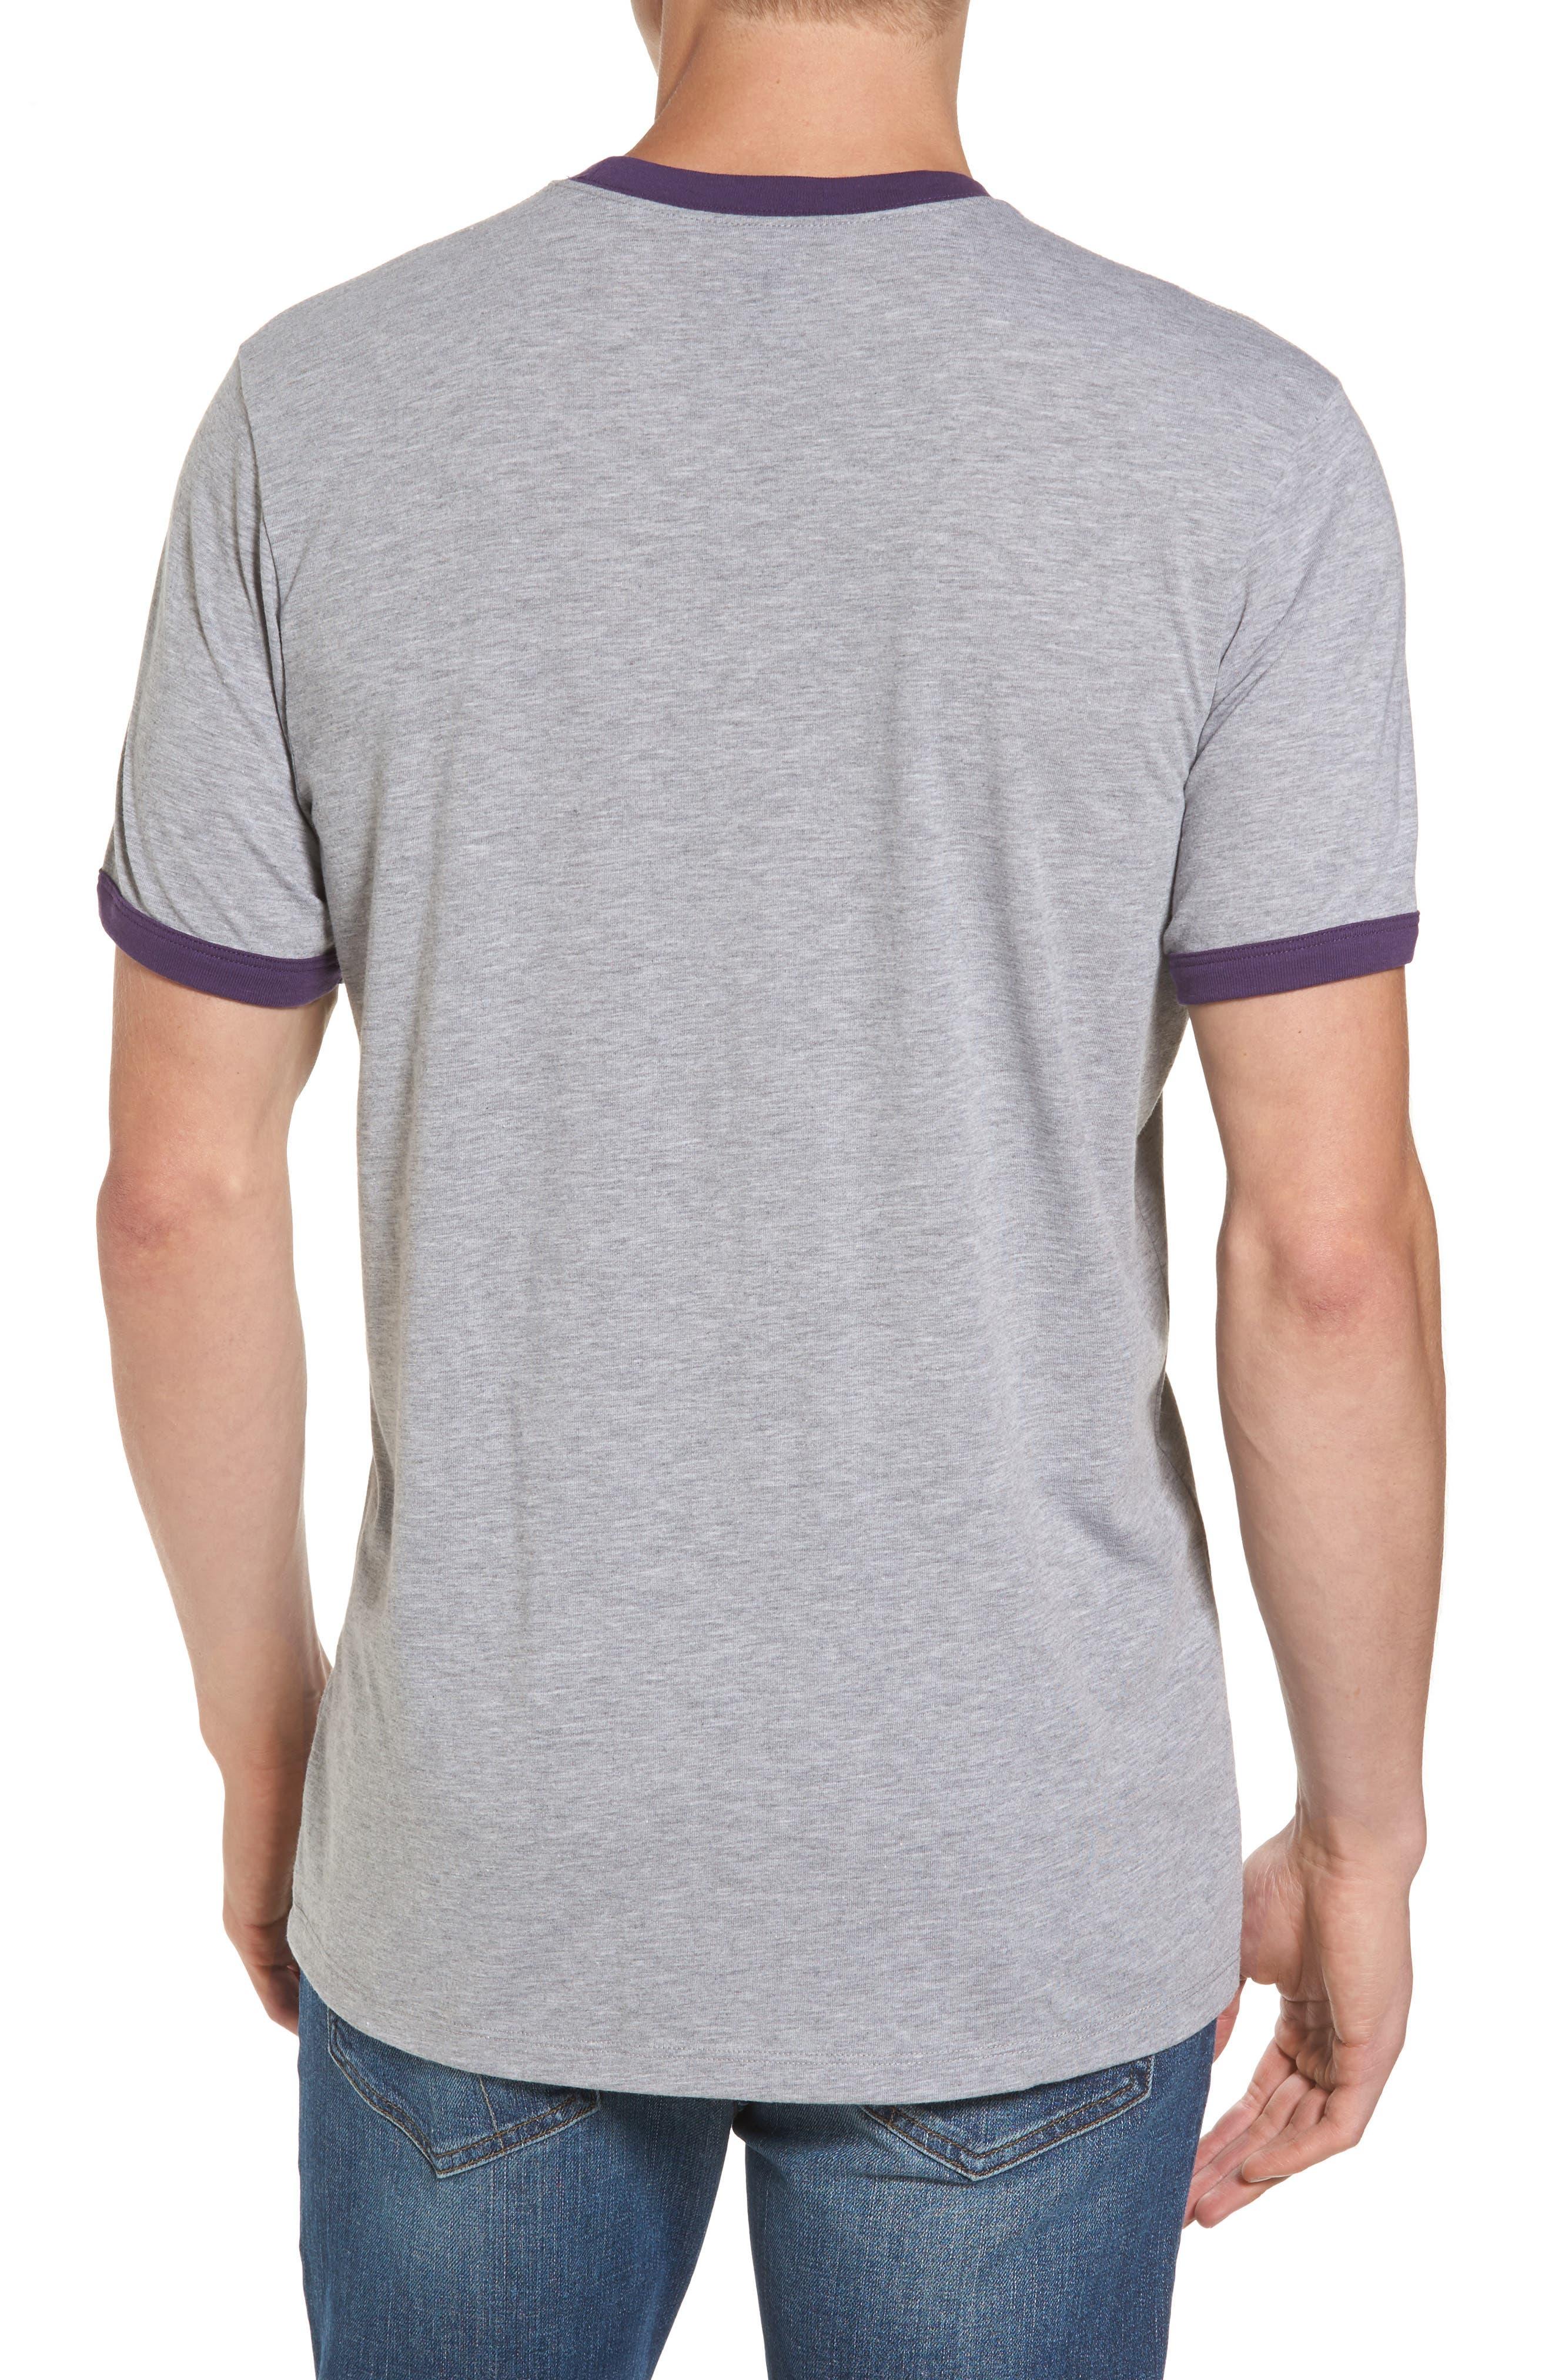 University of Washington Huskies Ringer T-Shirt,                             Alternate thumbnail 2, color,                             020